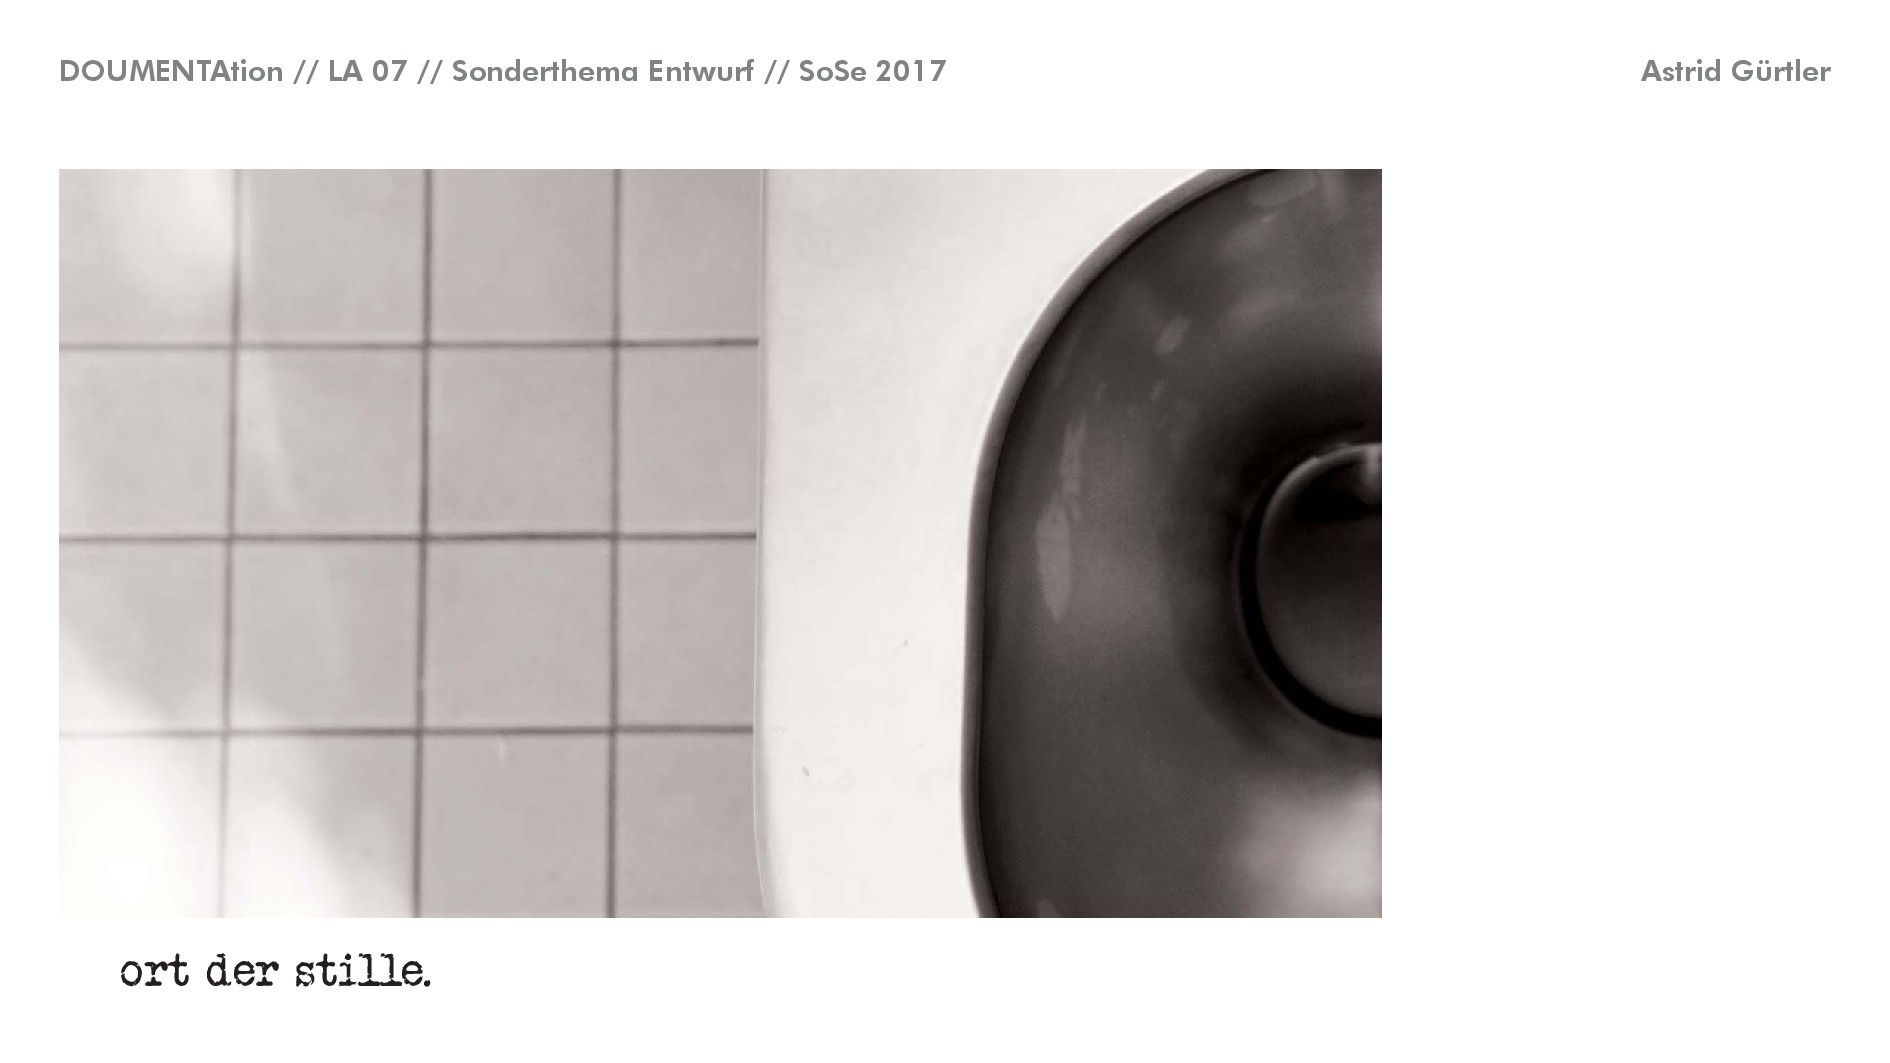 NEU Sonderthema Entwerfen SoSe 17 024